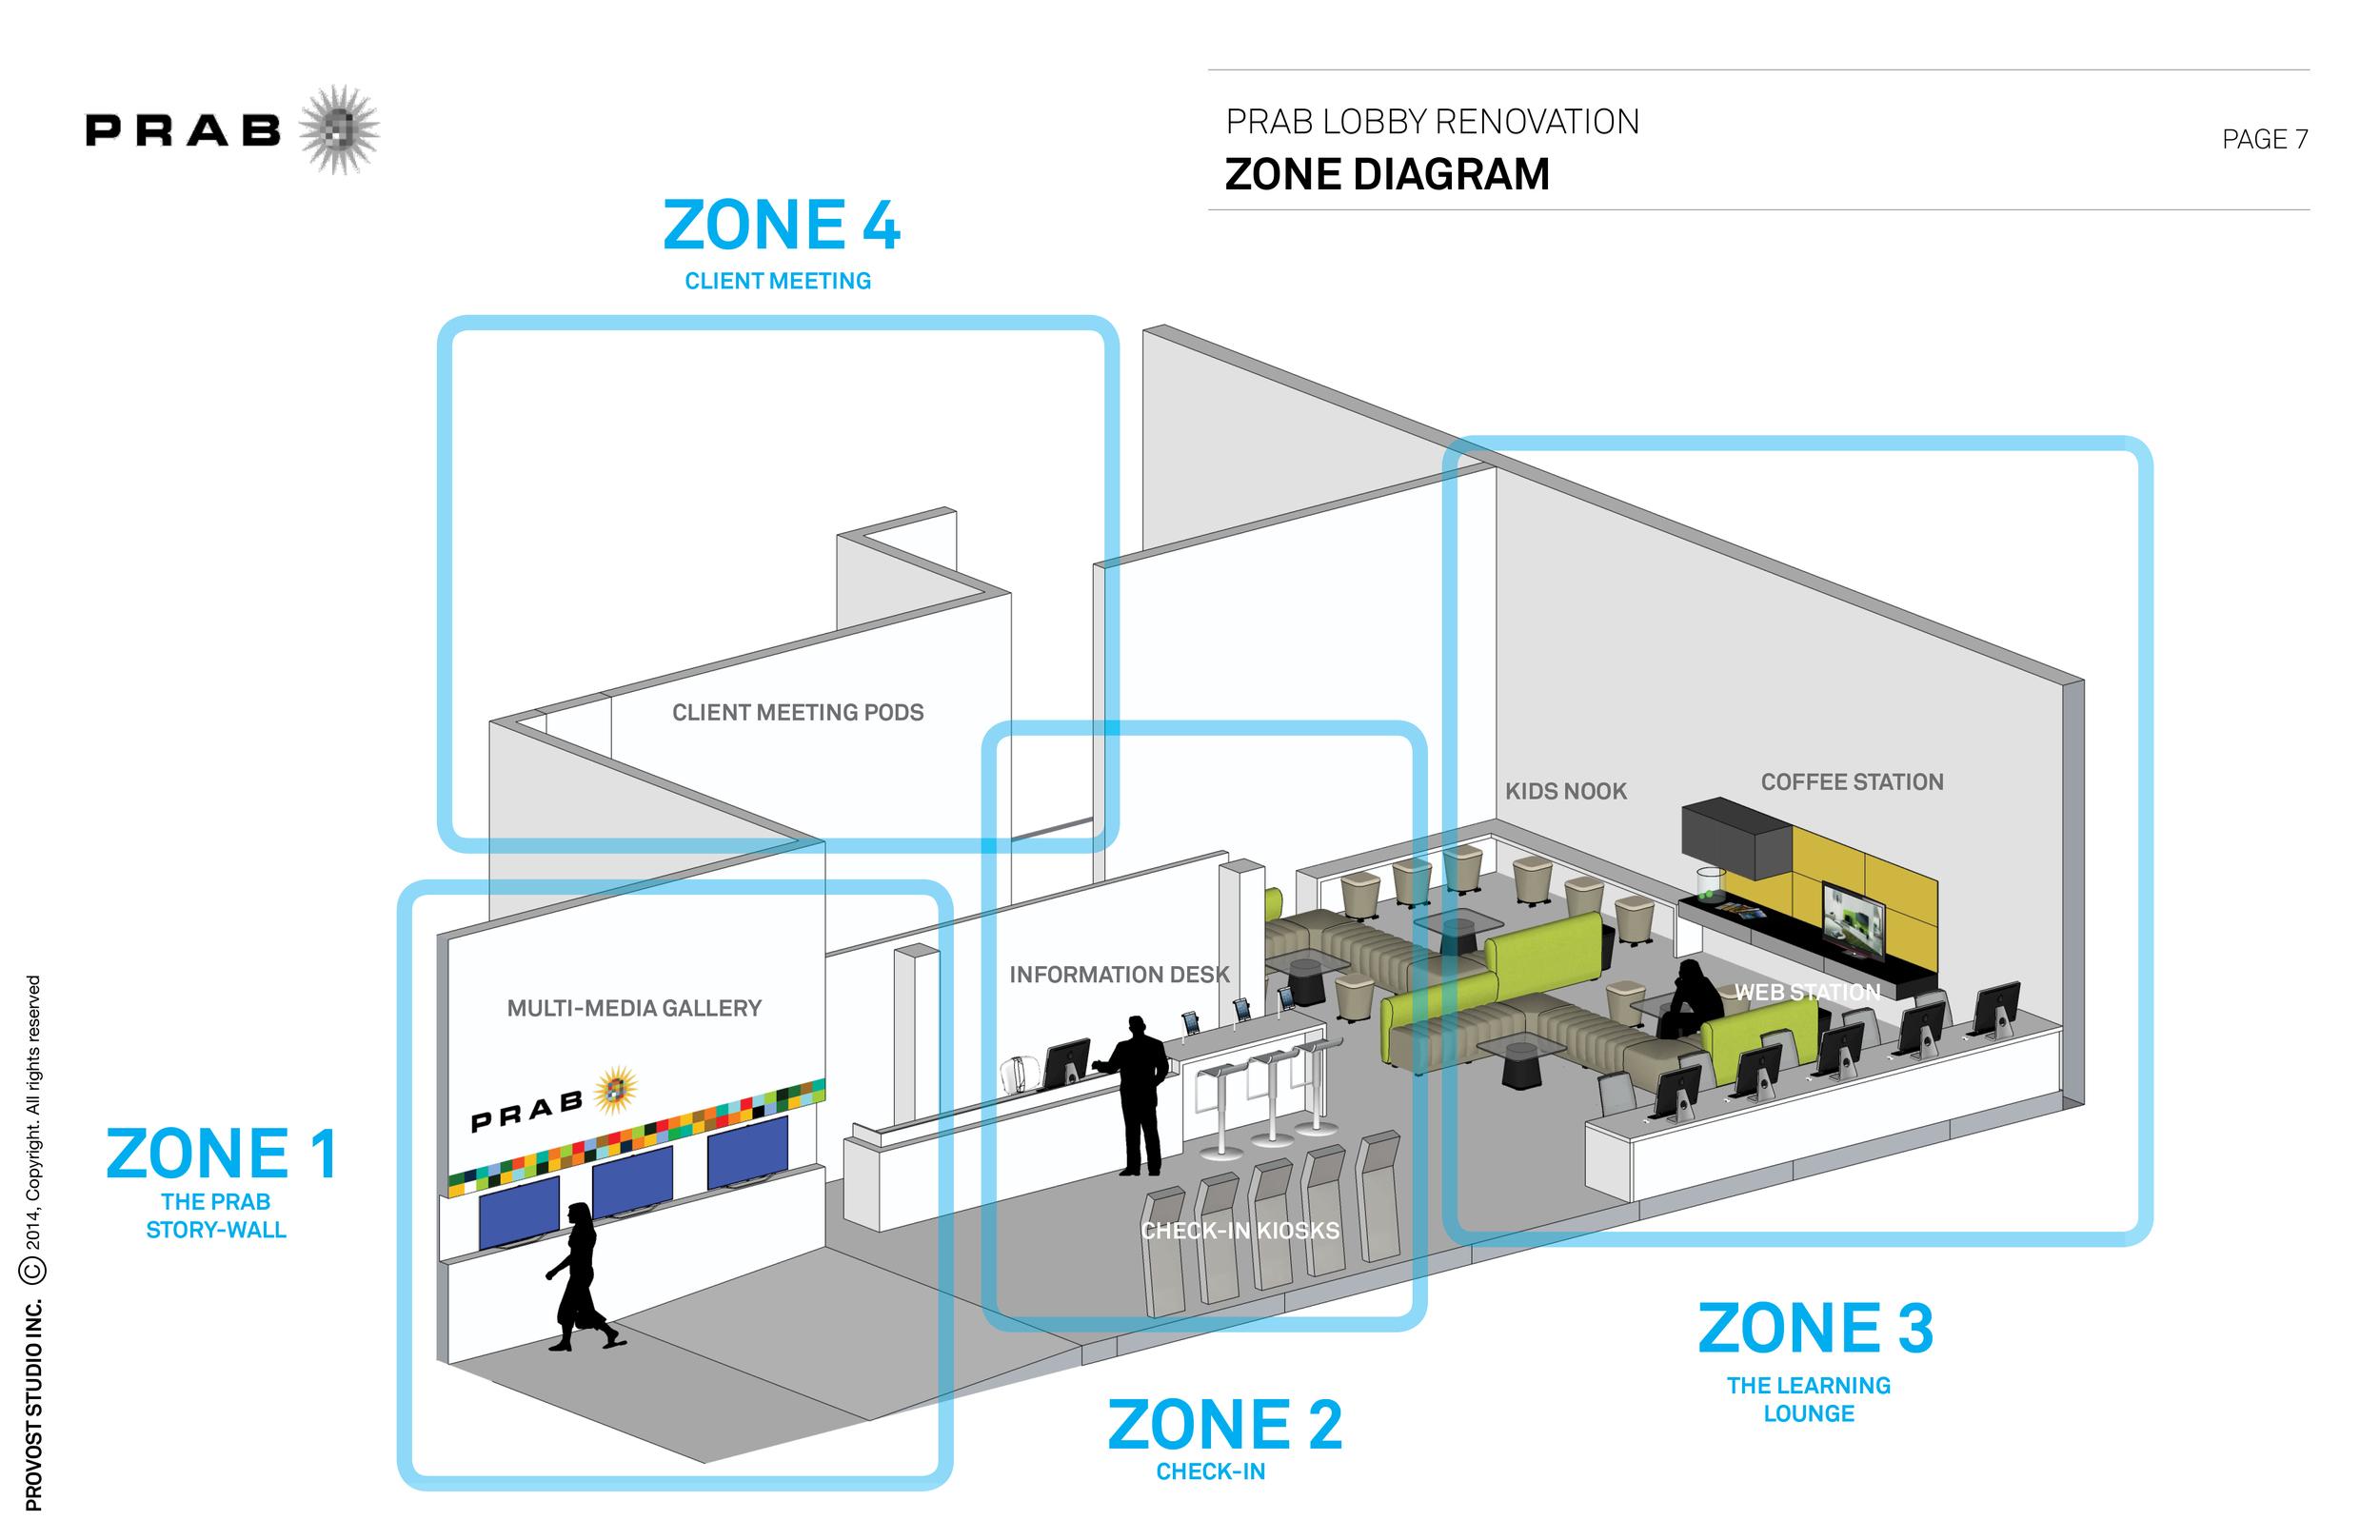 09192019_100pm_Concept Presentation_PRAB_Lobby Renovation7.jpg